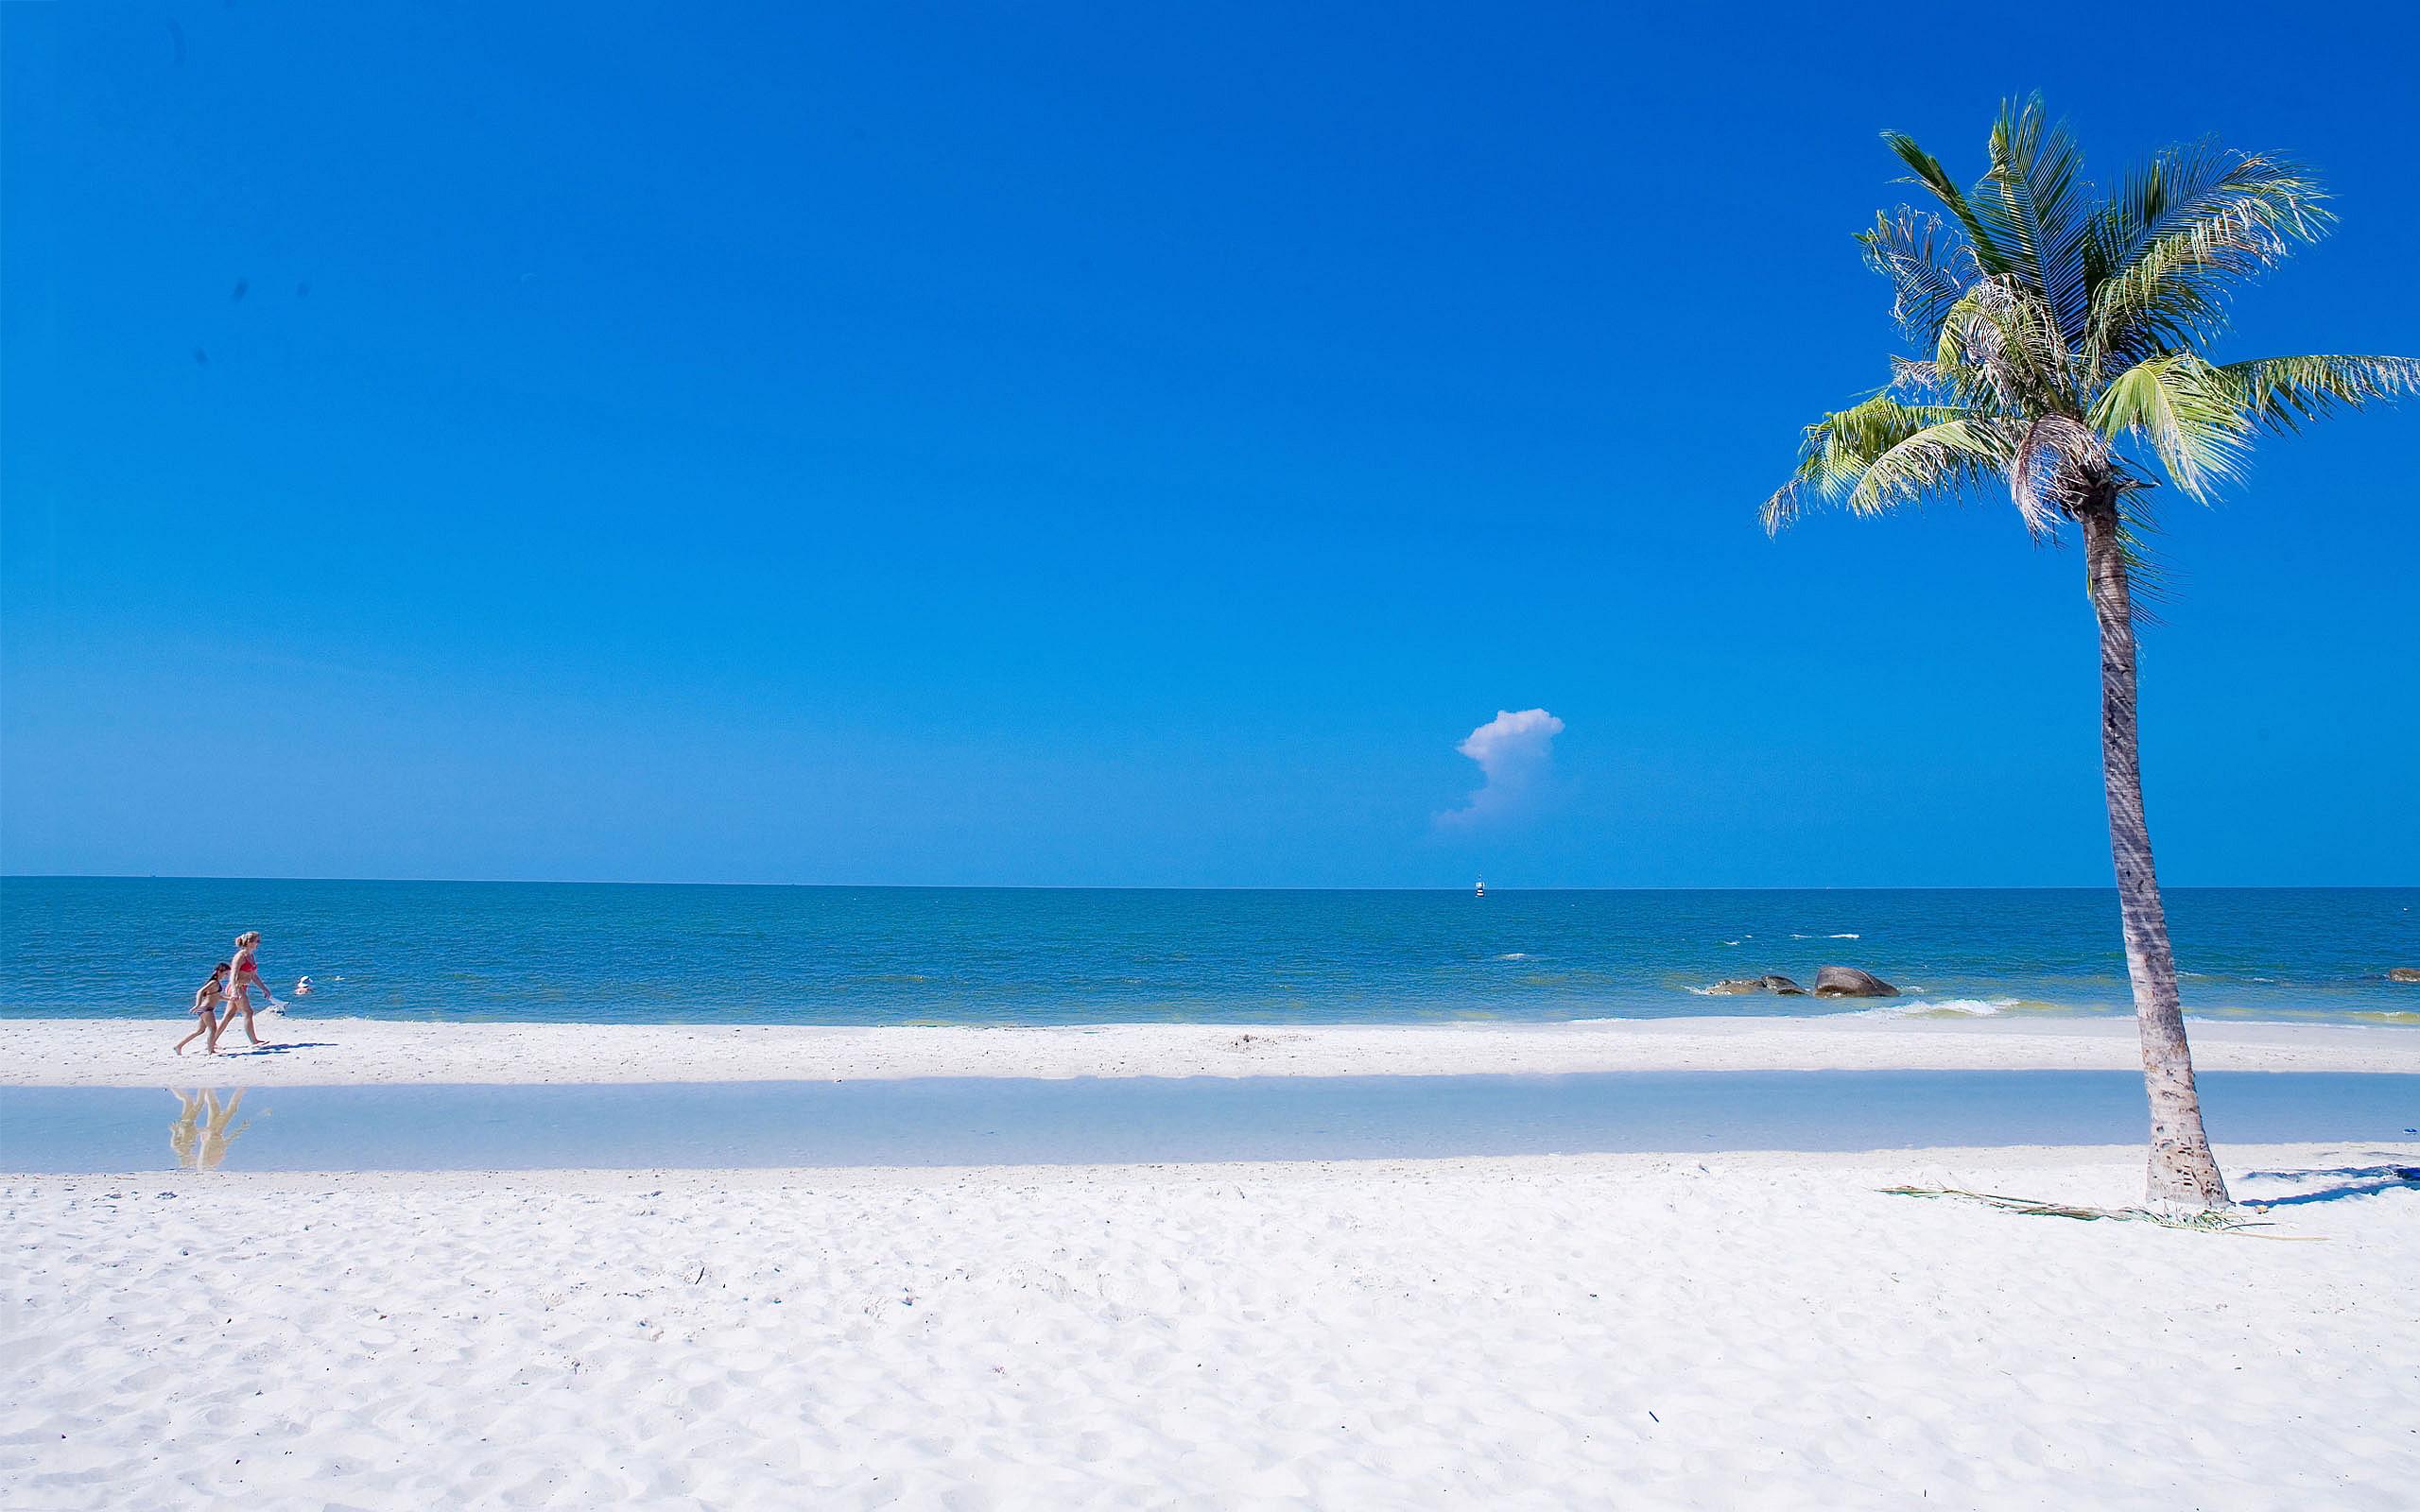 Beach Summer Ocean Wallpapers Pictures Photos 2540   HD Desktop 2560x1600